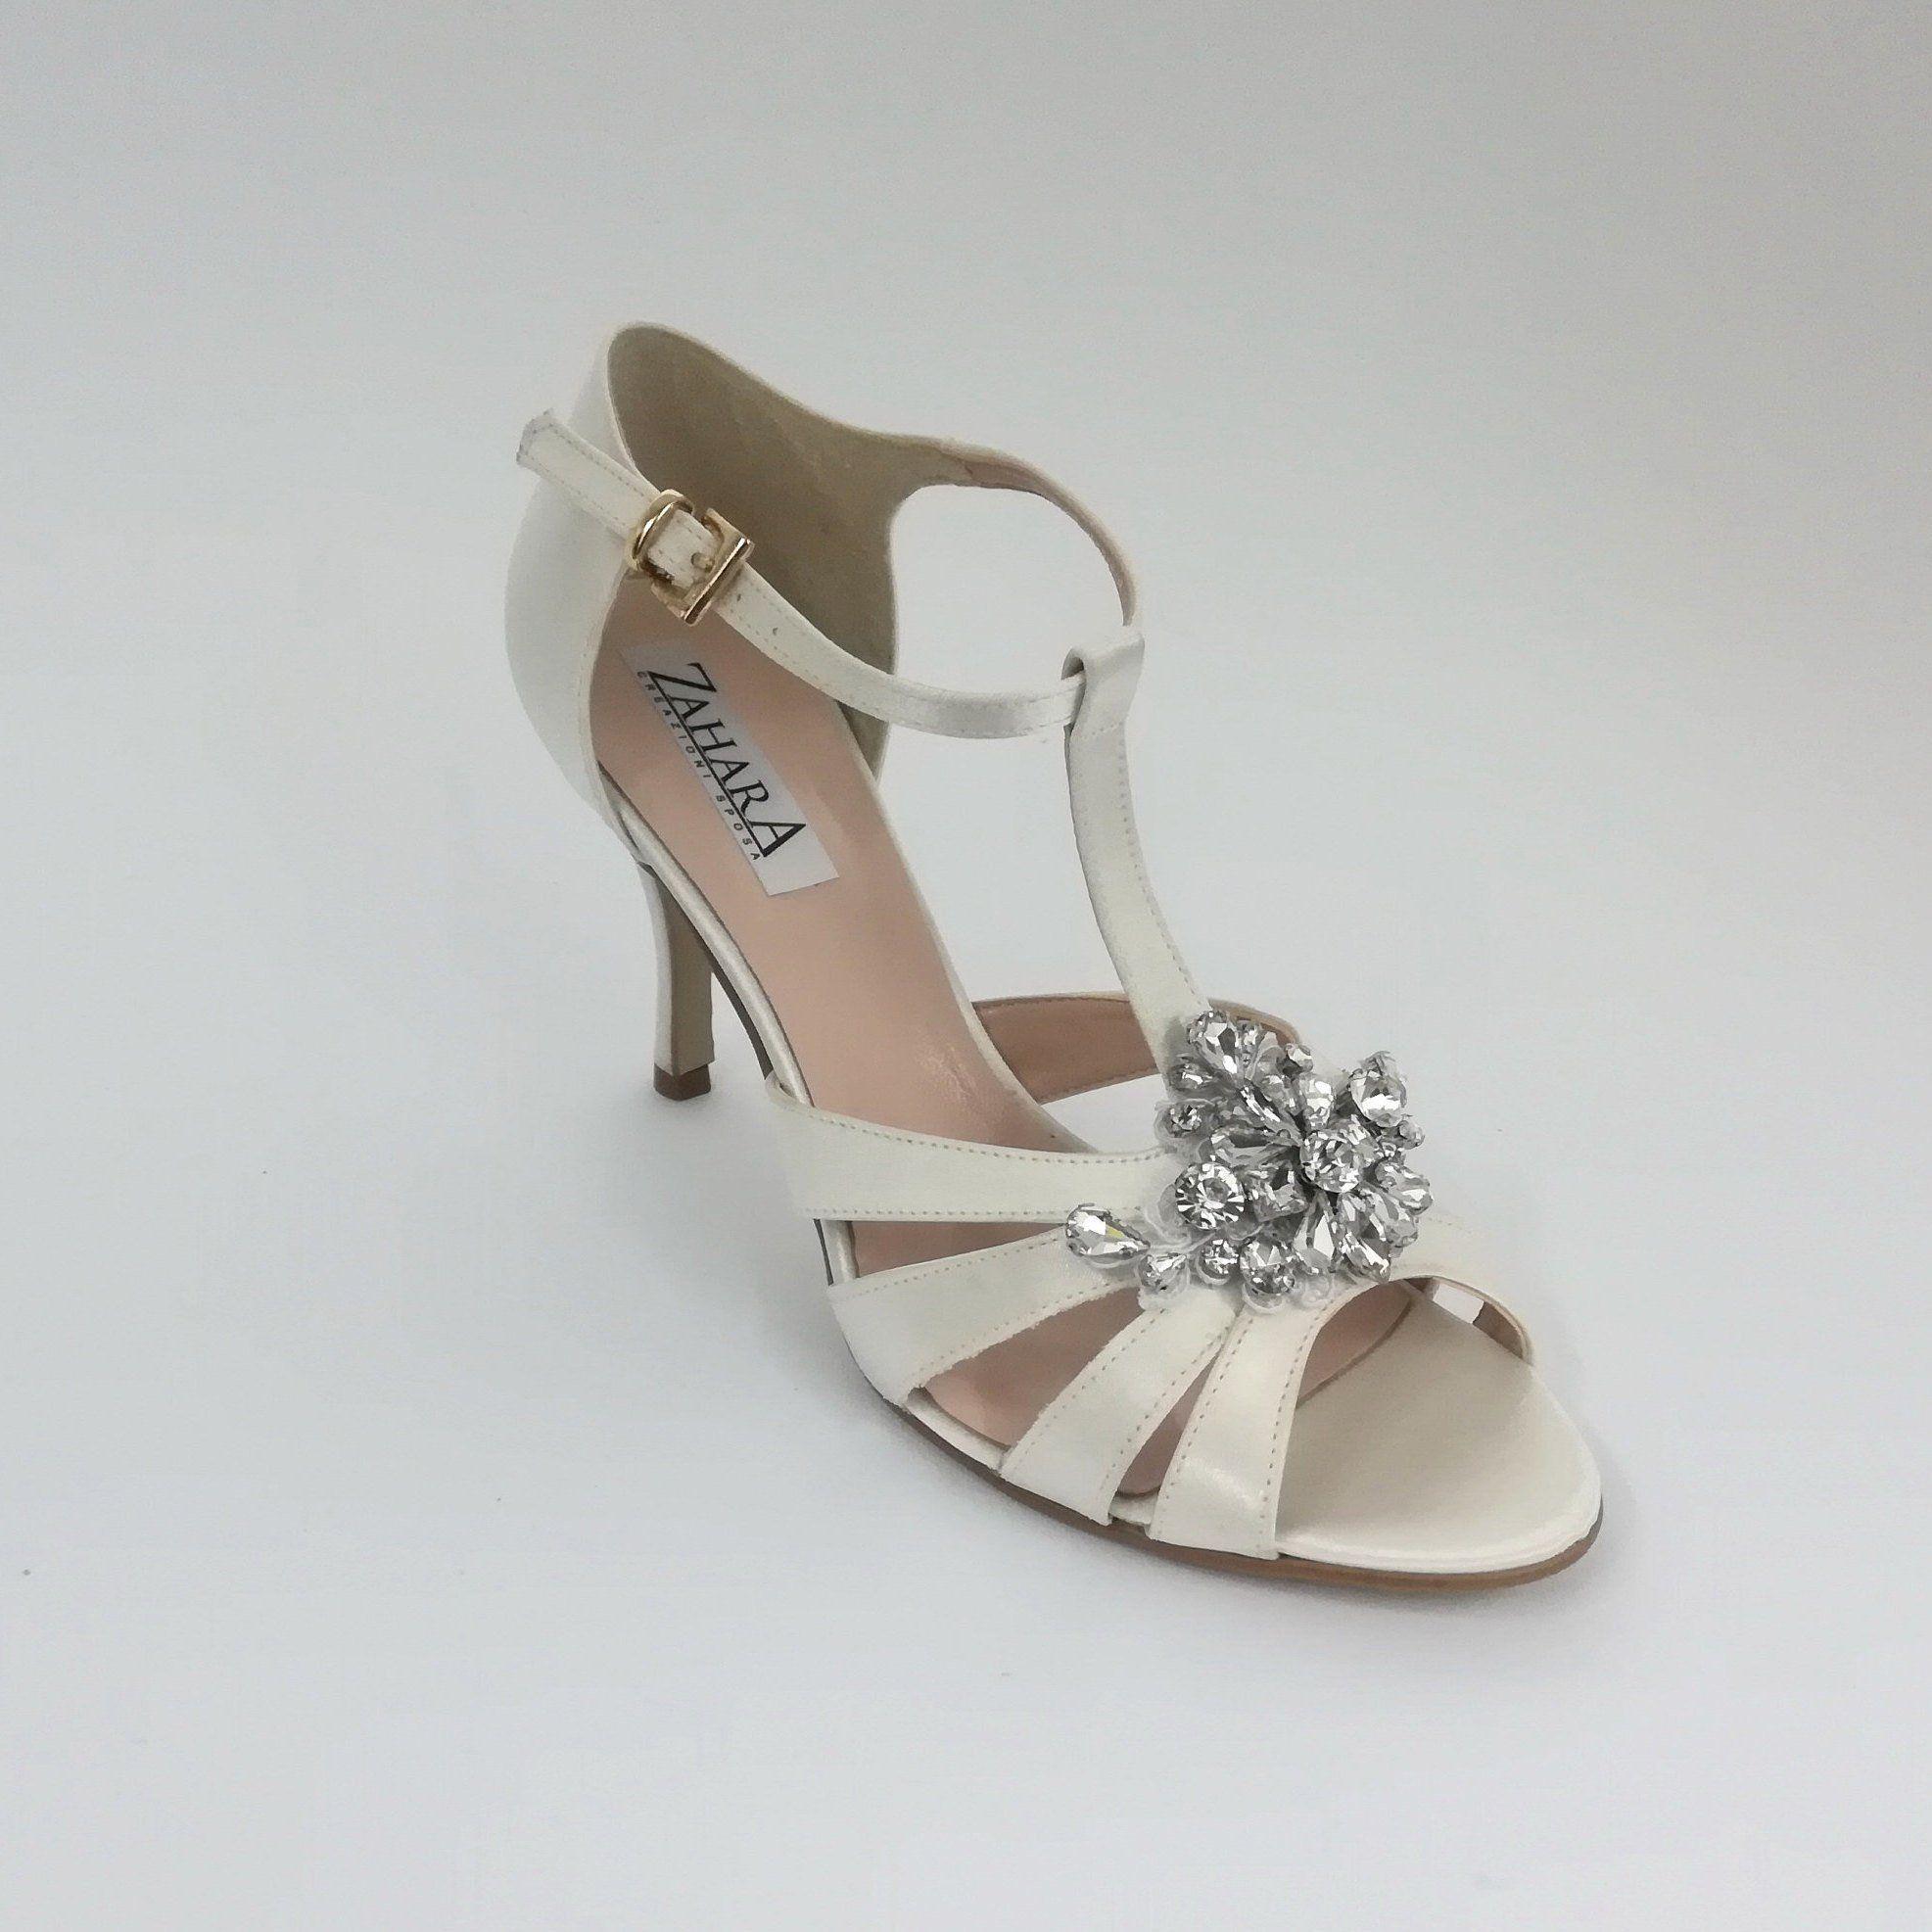 Scarpe E Scarpe Sposa.Custom Made In Italy Bridal Shoes Scarpe Da Sposa Scarpe E